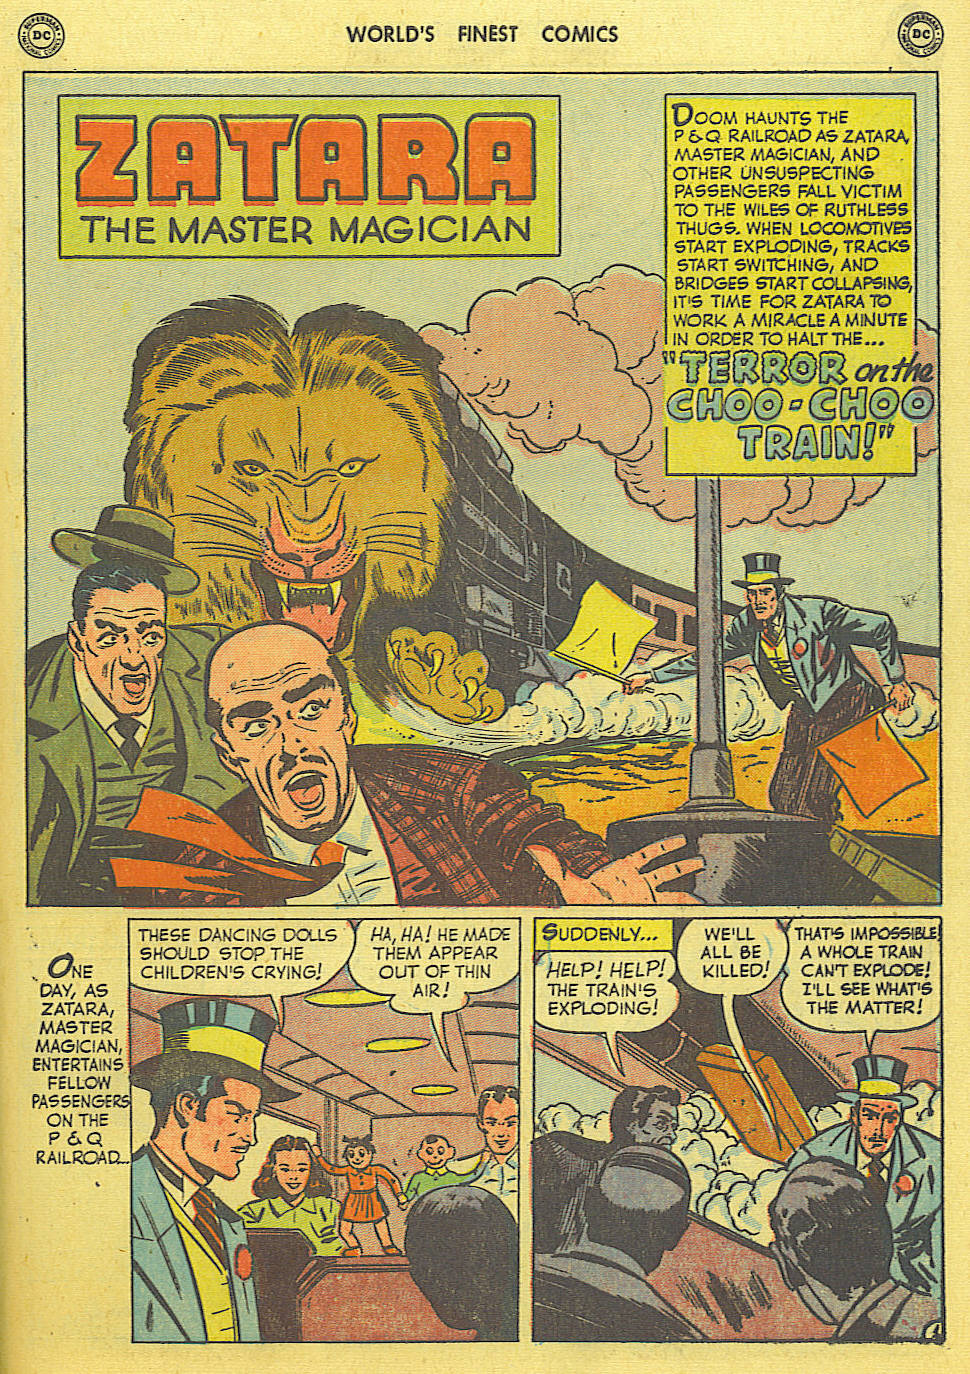 Read online World's Finest Comics comic -  Issue #49 - 52